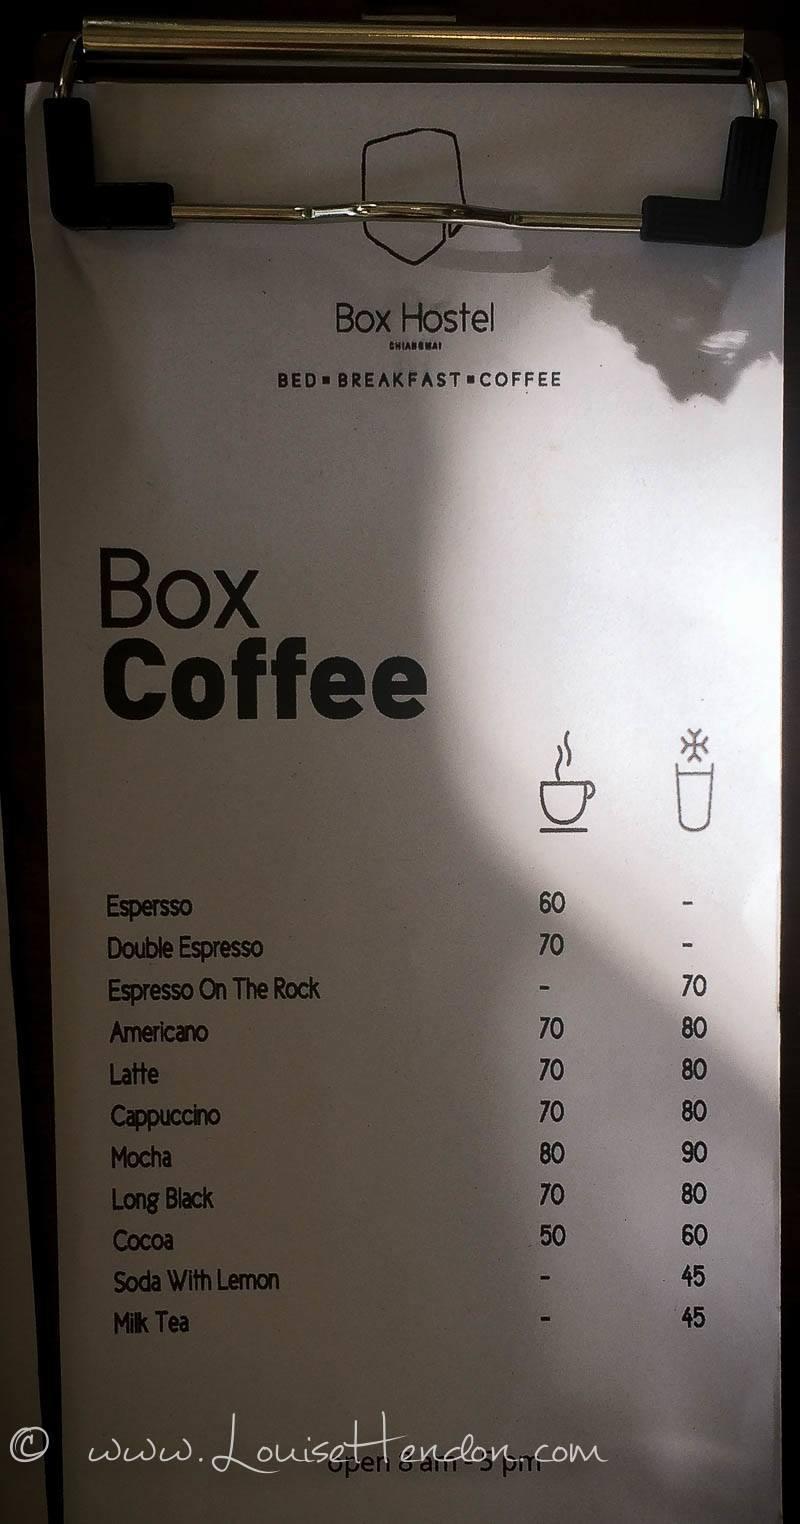 menu at box cafe and hostel in chiang mai thailand